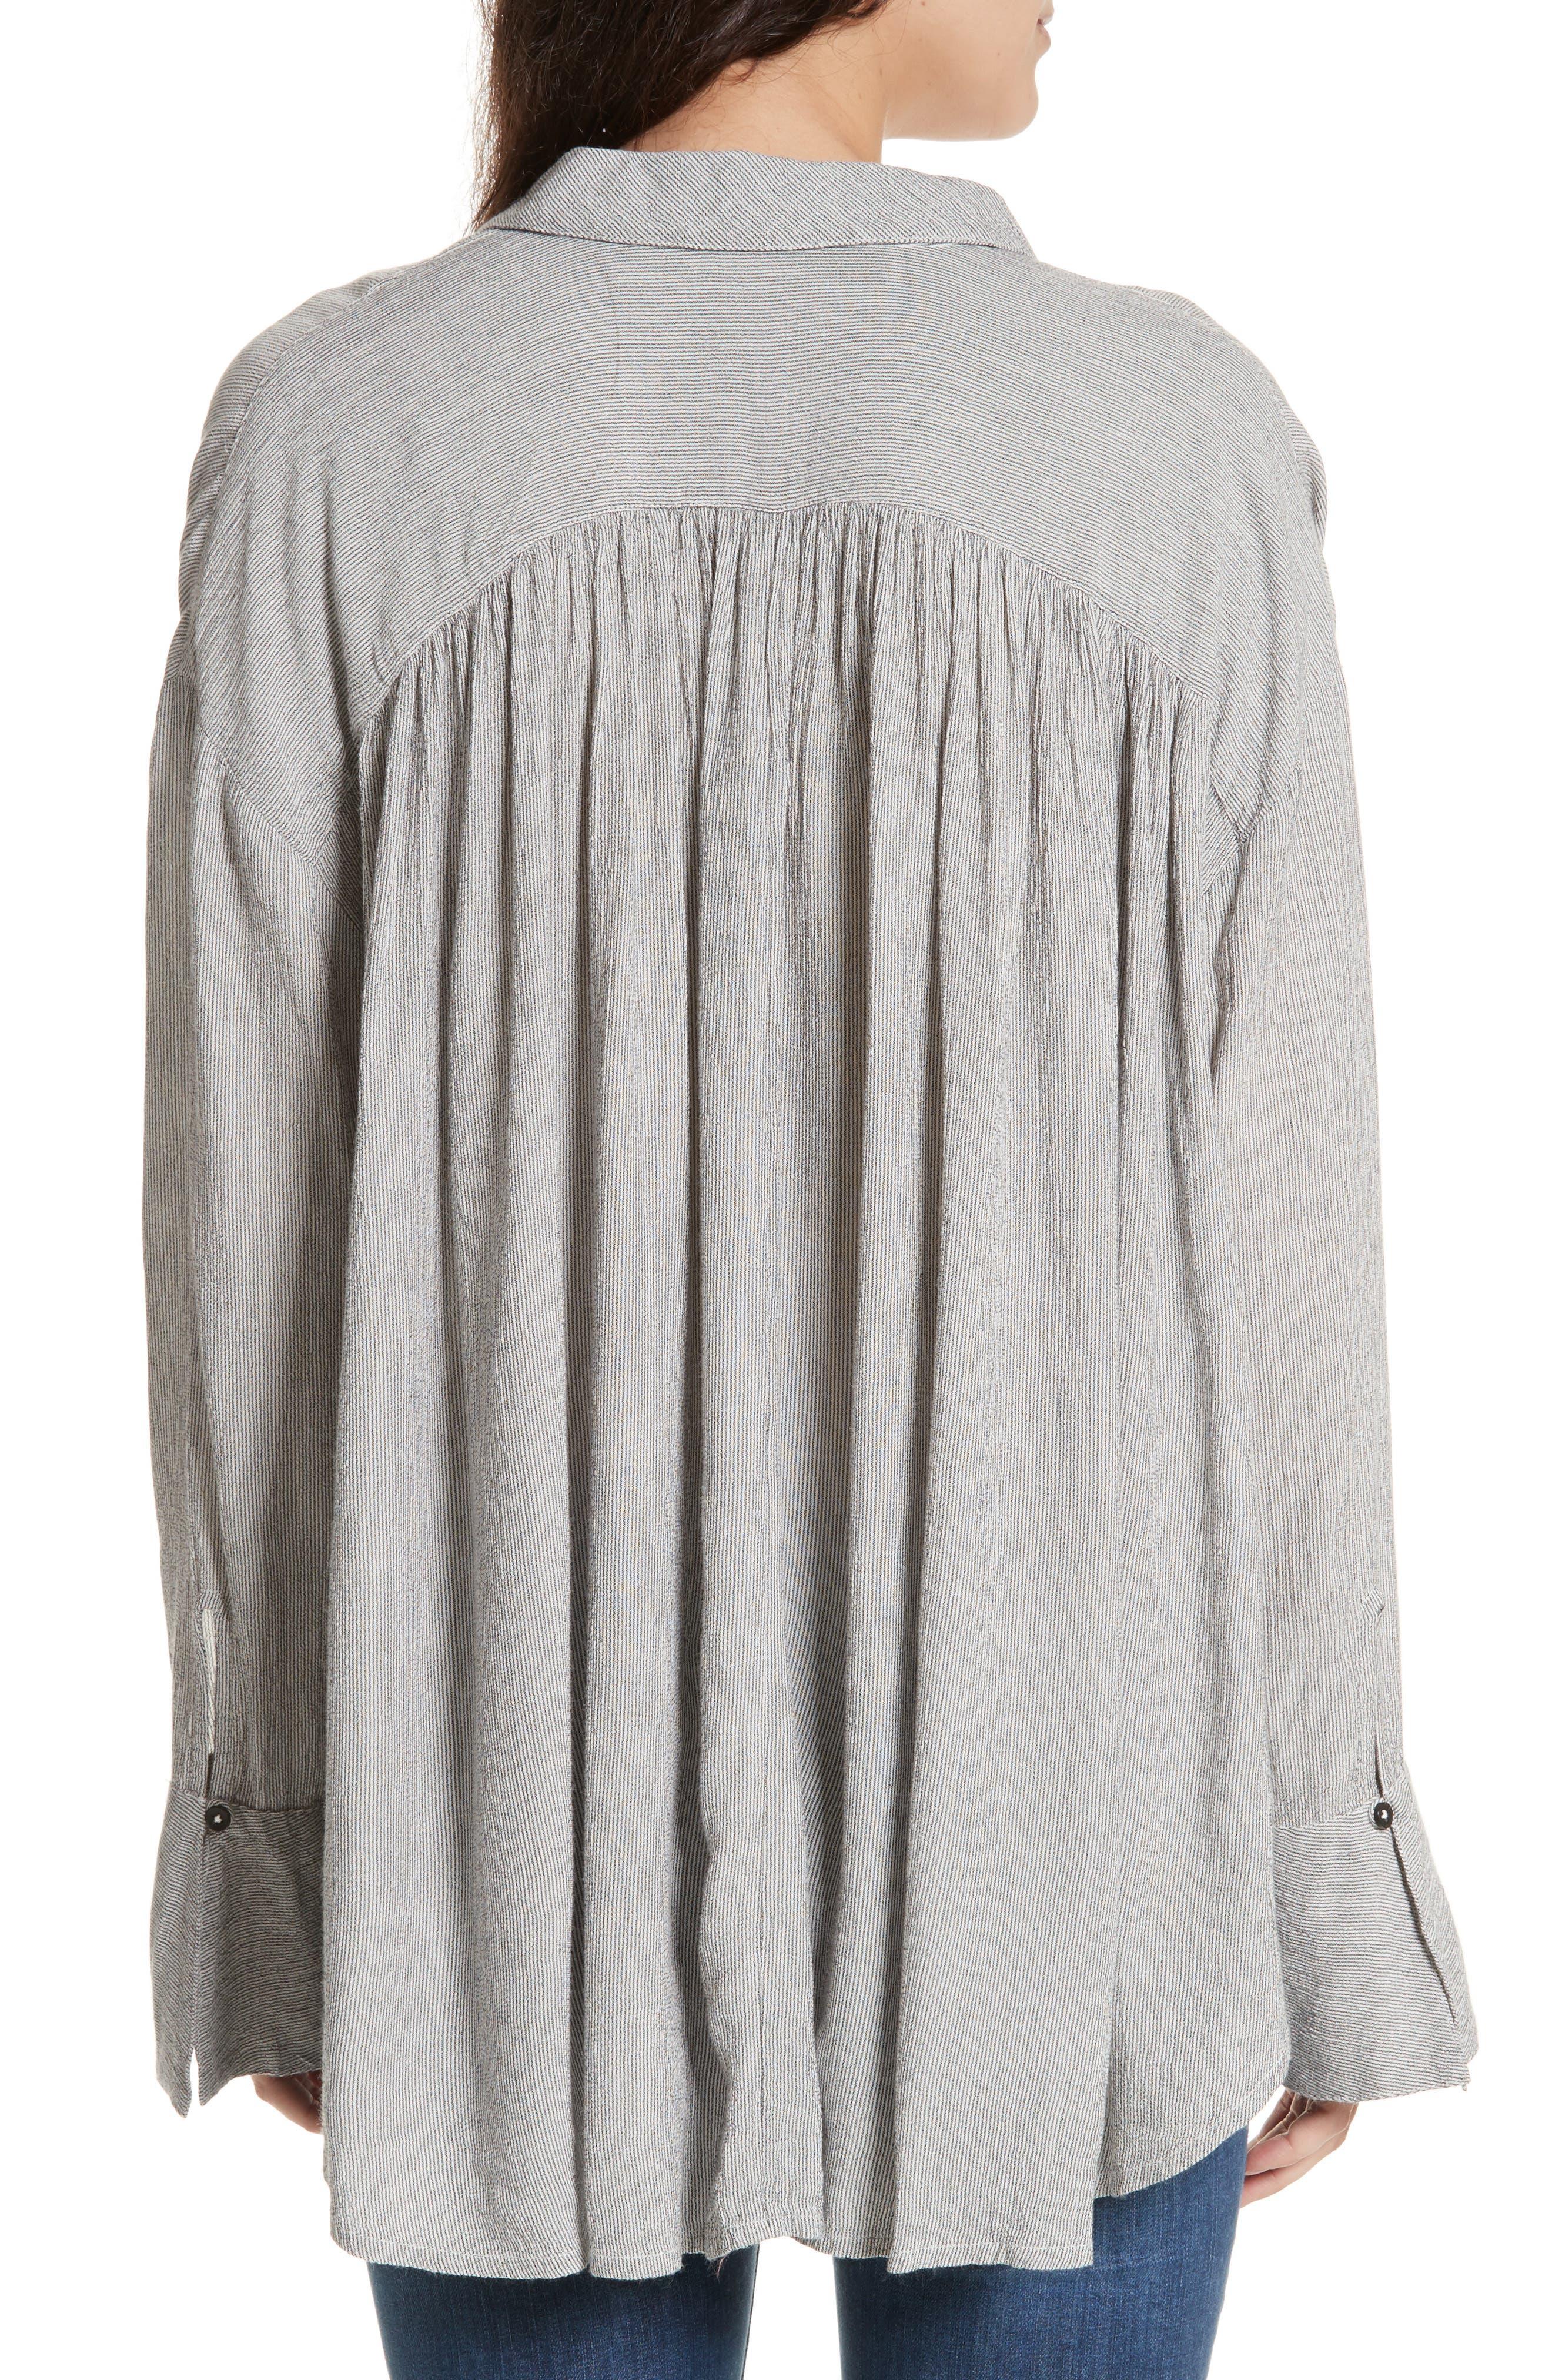 Magic Breeze Shirt,                             Alternate thumbnail 4, color,